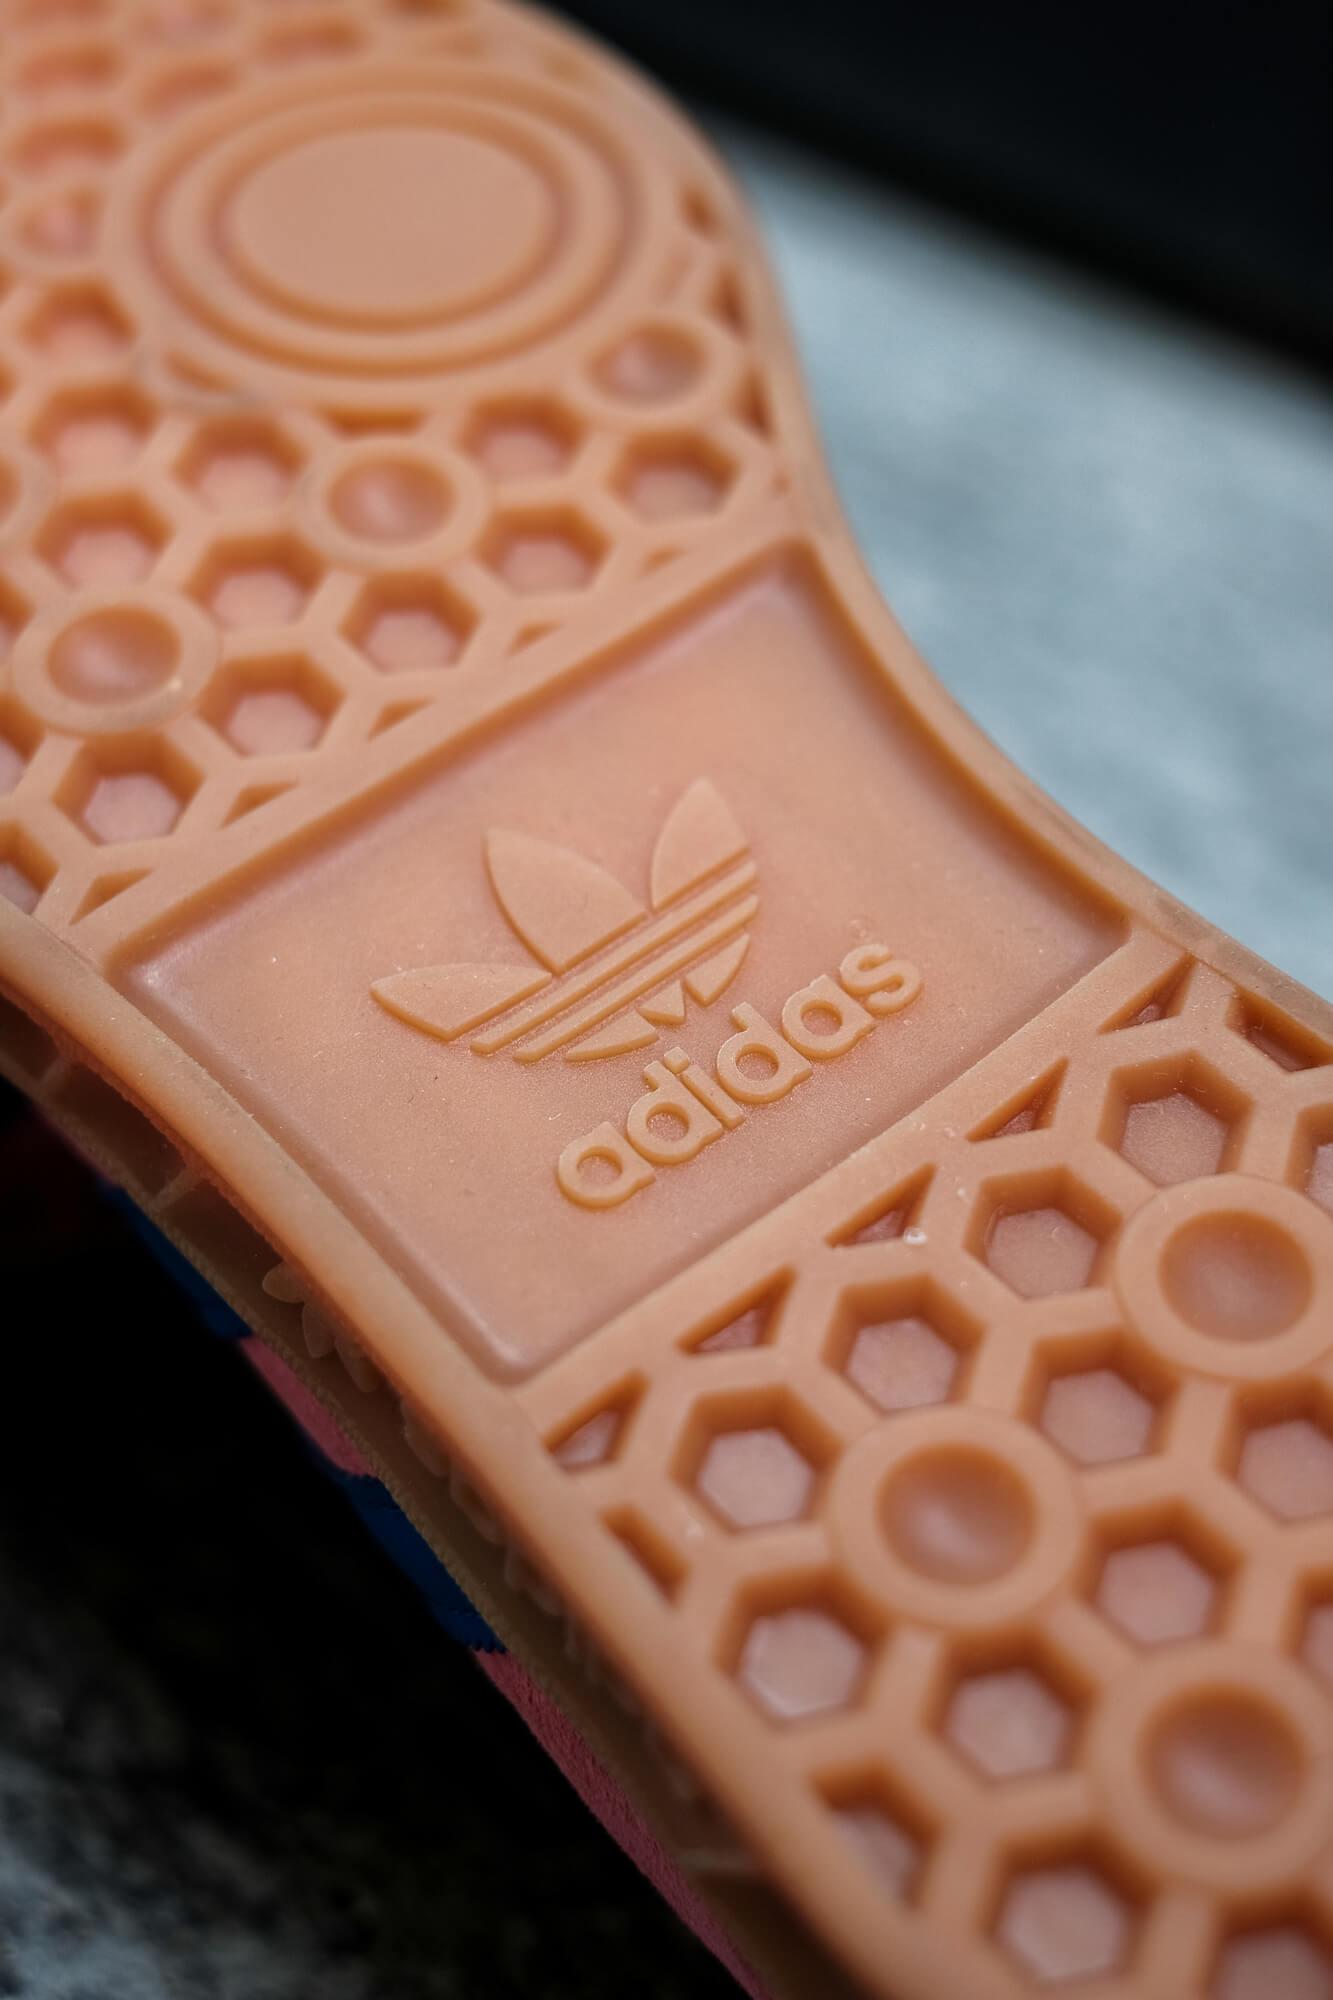 detail of the gum sole, adidas Hamburg - roston/boblue/gum2 - H00446